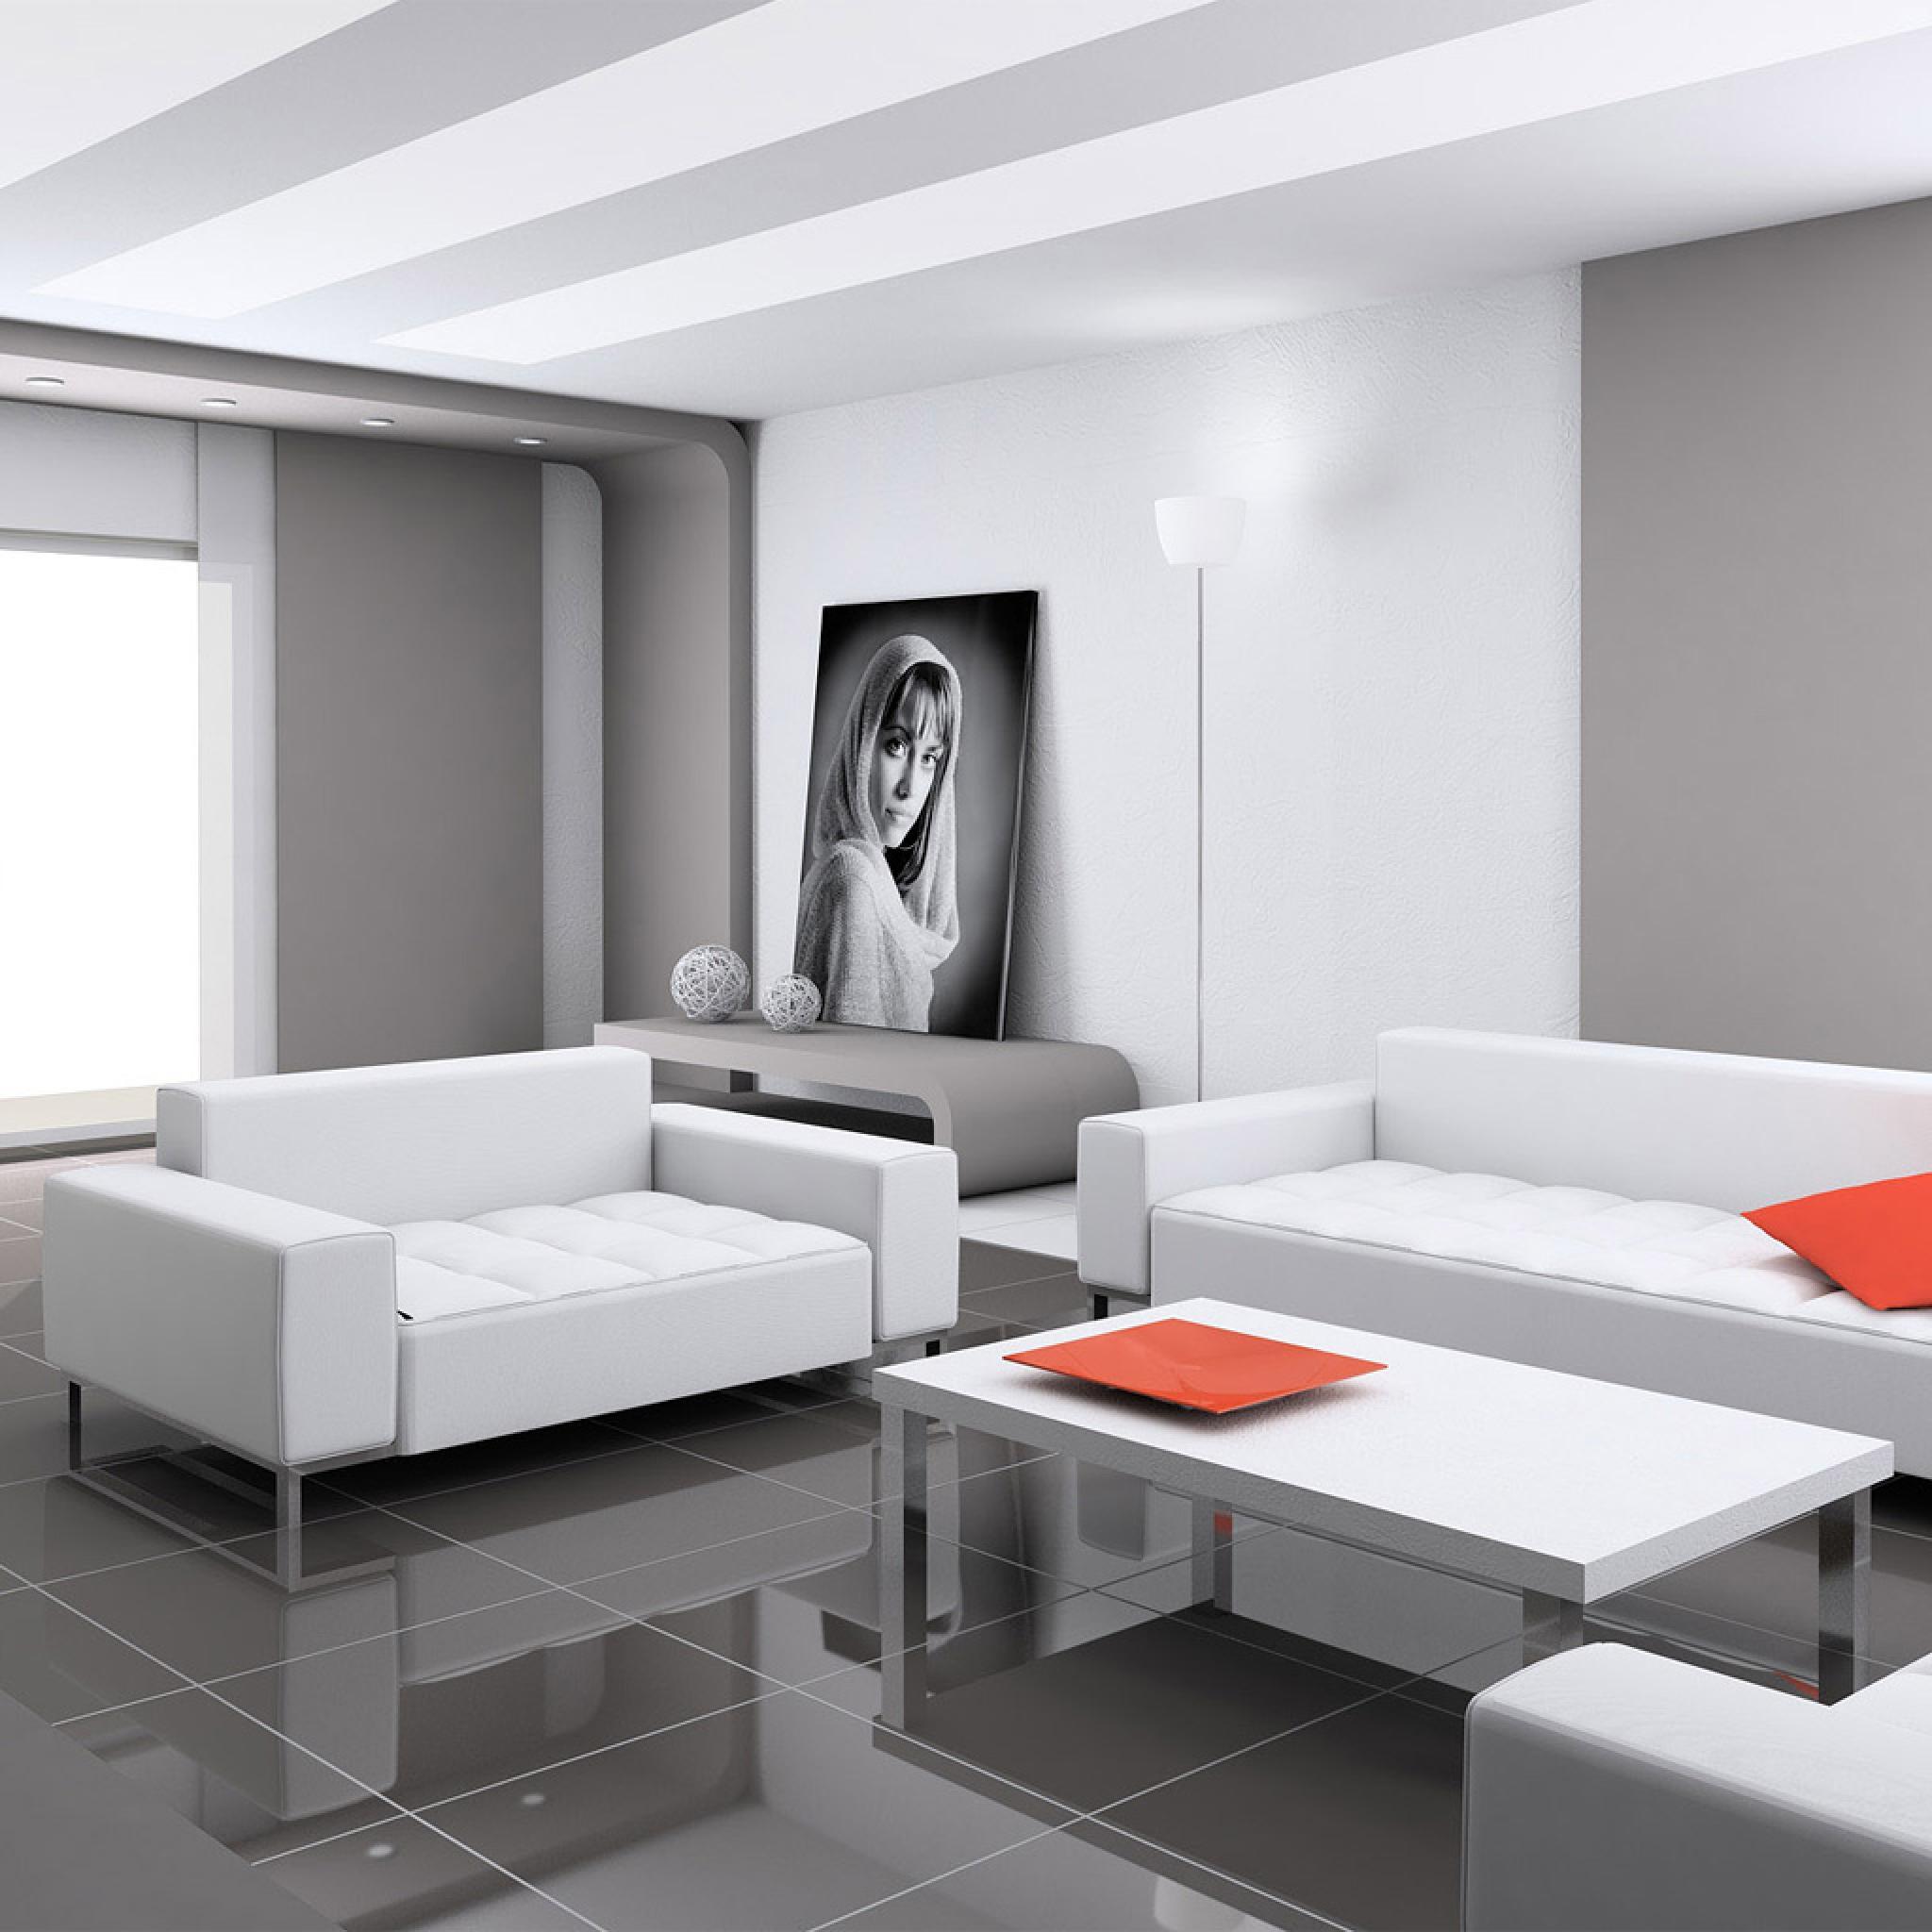 Miscellaneous - Minimalist Living Room Design Ideas - iPad ... on Minimalist Living Room Design  id=70246